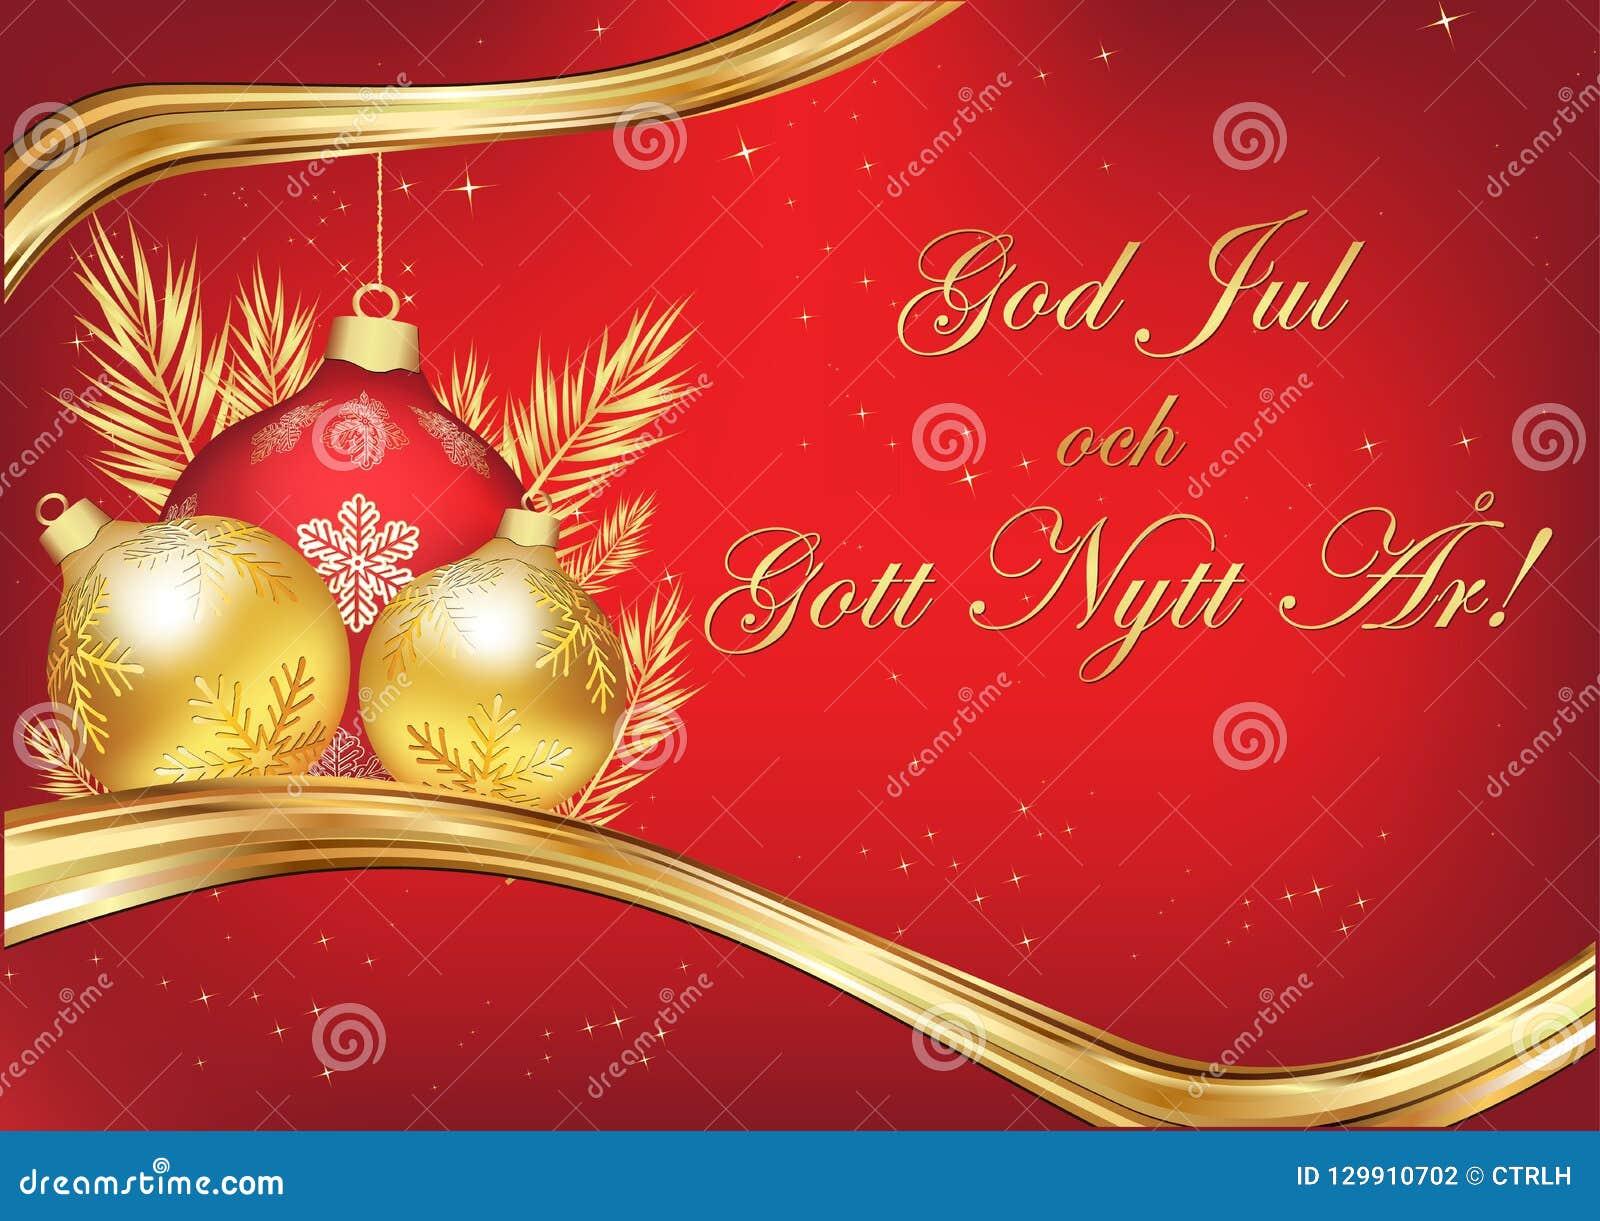 Elegant Merry Christmas And Happy New Year Written In Swedish, Season`s Greeting  Card